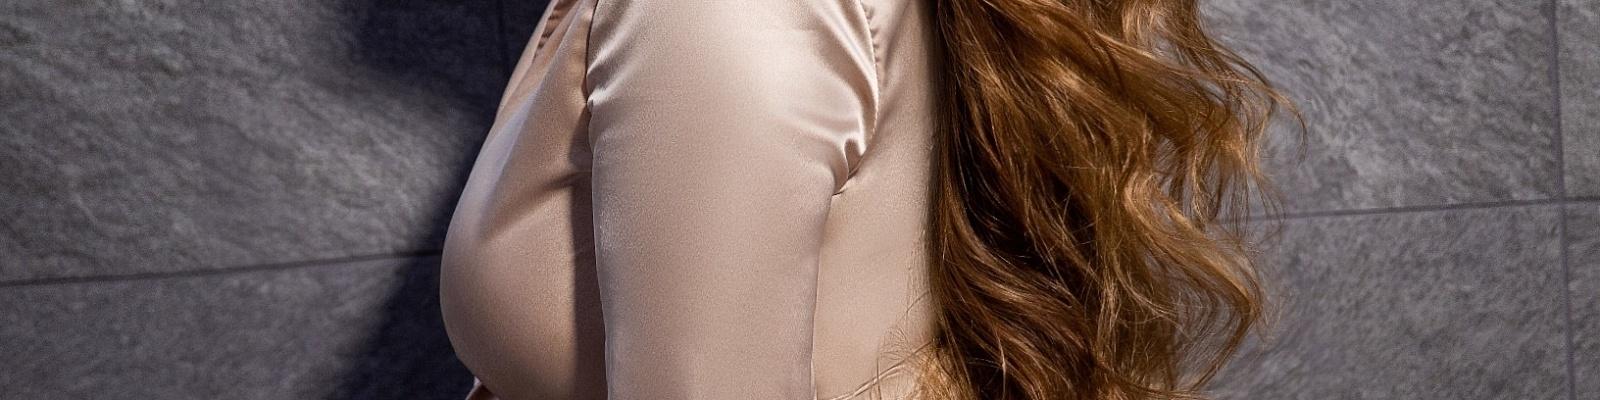 Alexa Grey's Cover Photo